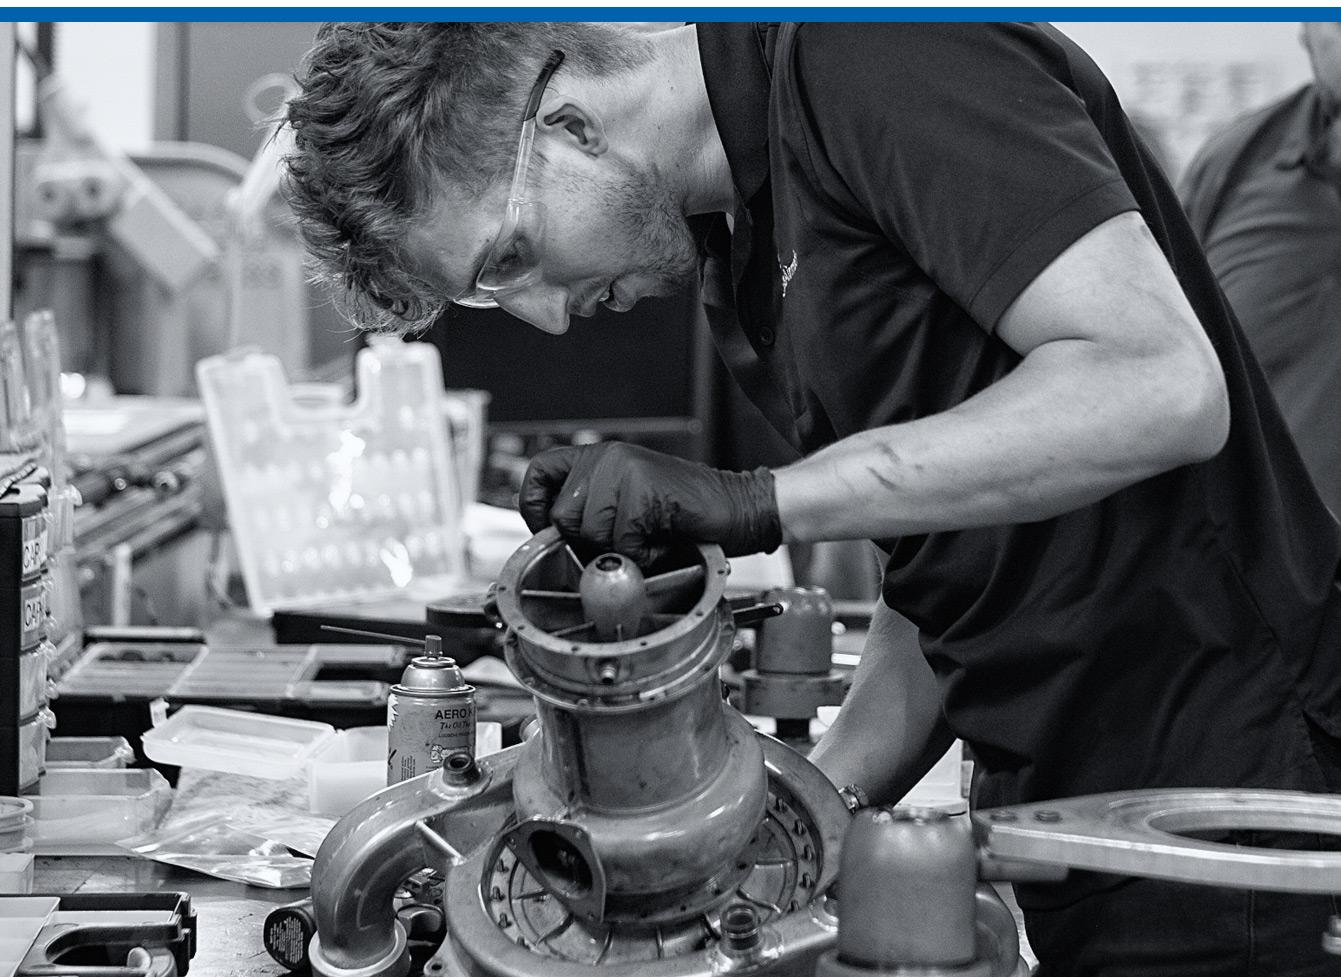 Aircraft Engine Repair & Overhaul Services - Dallas Airmotive